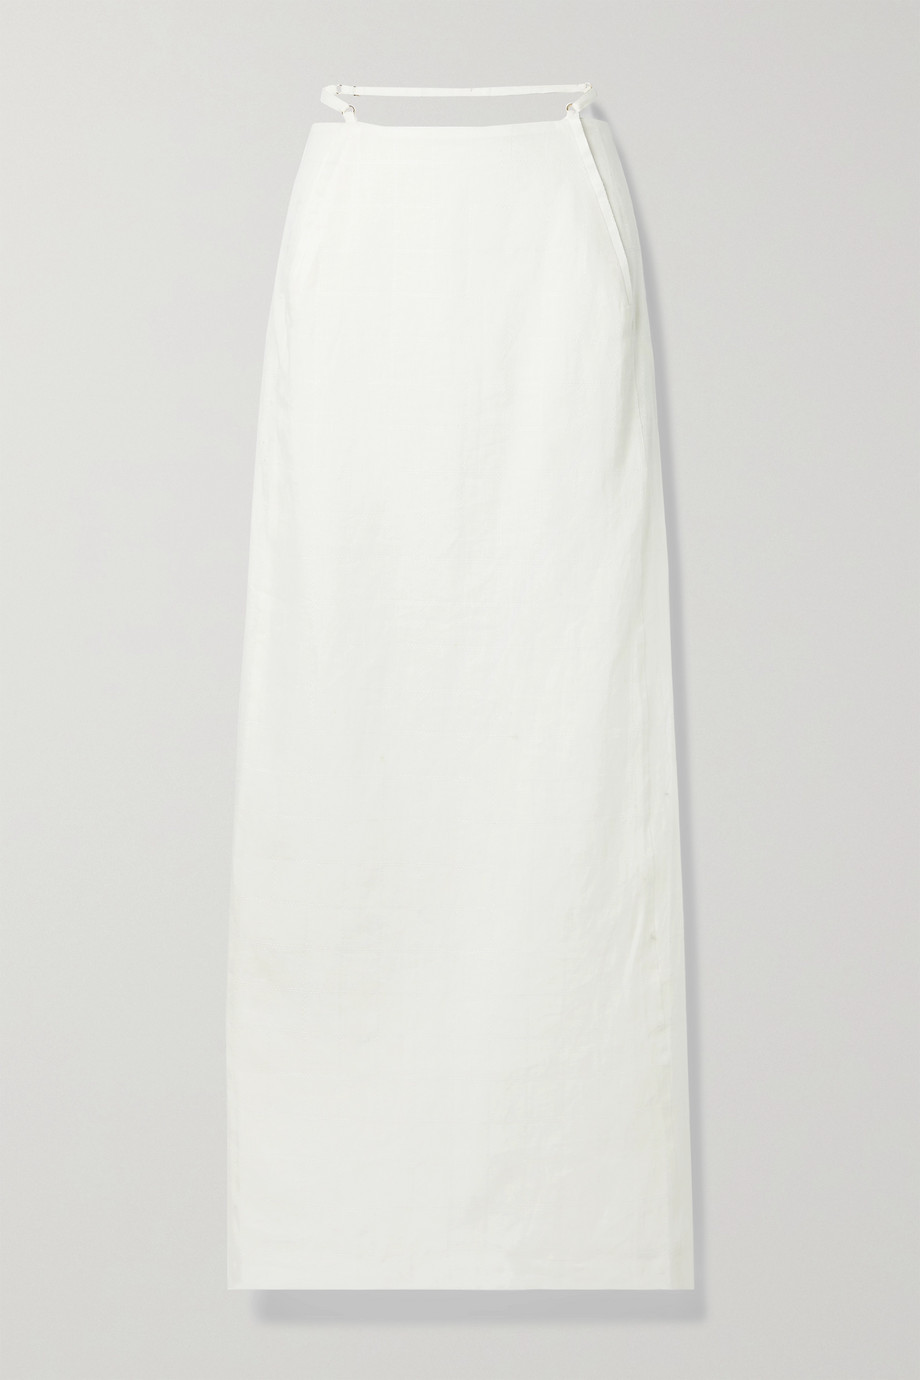 Jacquemus Novio cutout linen-jacquard maxi skirt